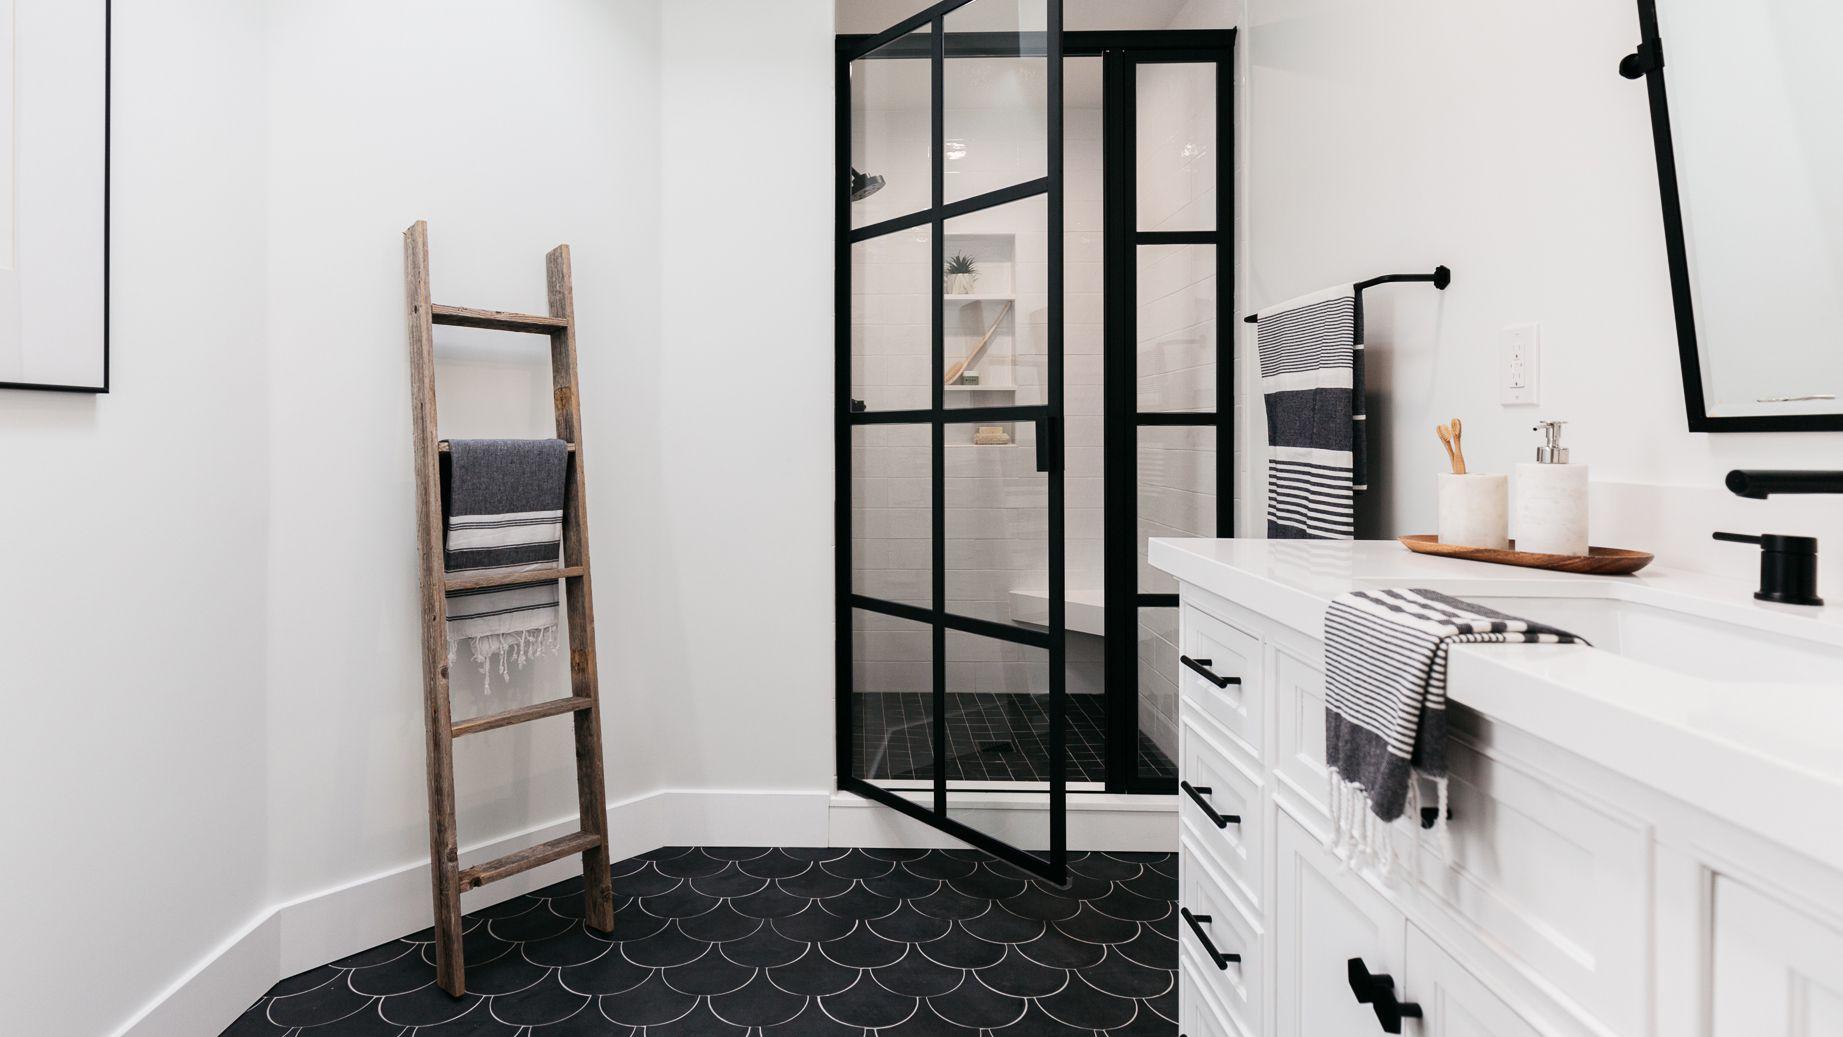 19 Inspirational Black And White Bathrooms, Black And White Bathroom Set